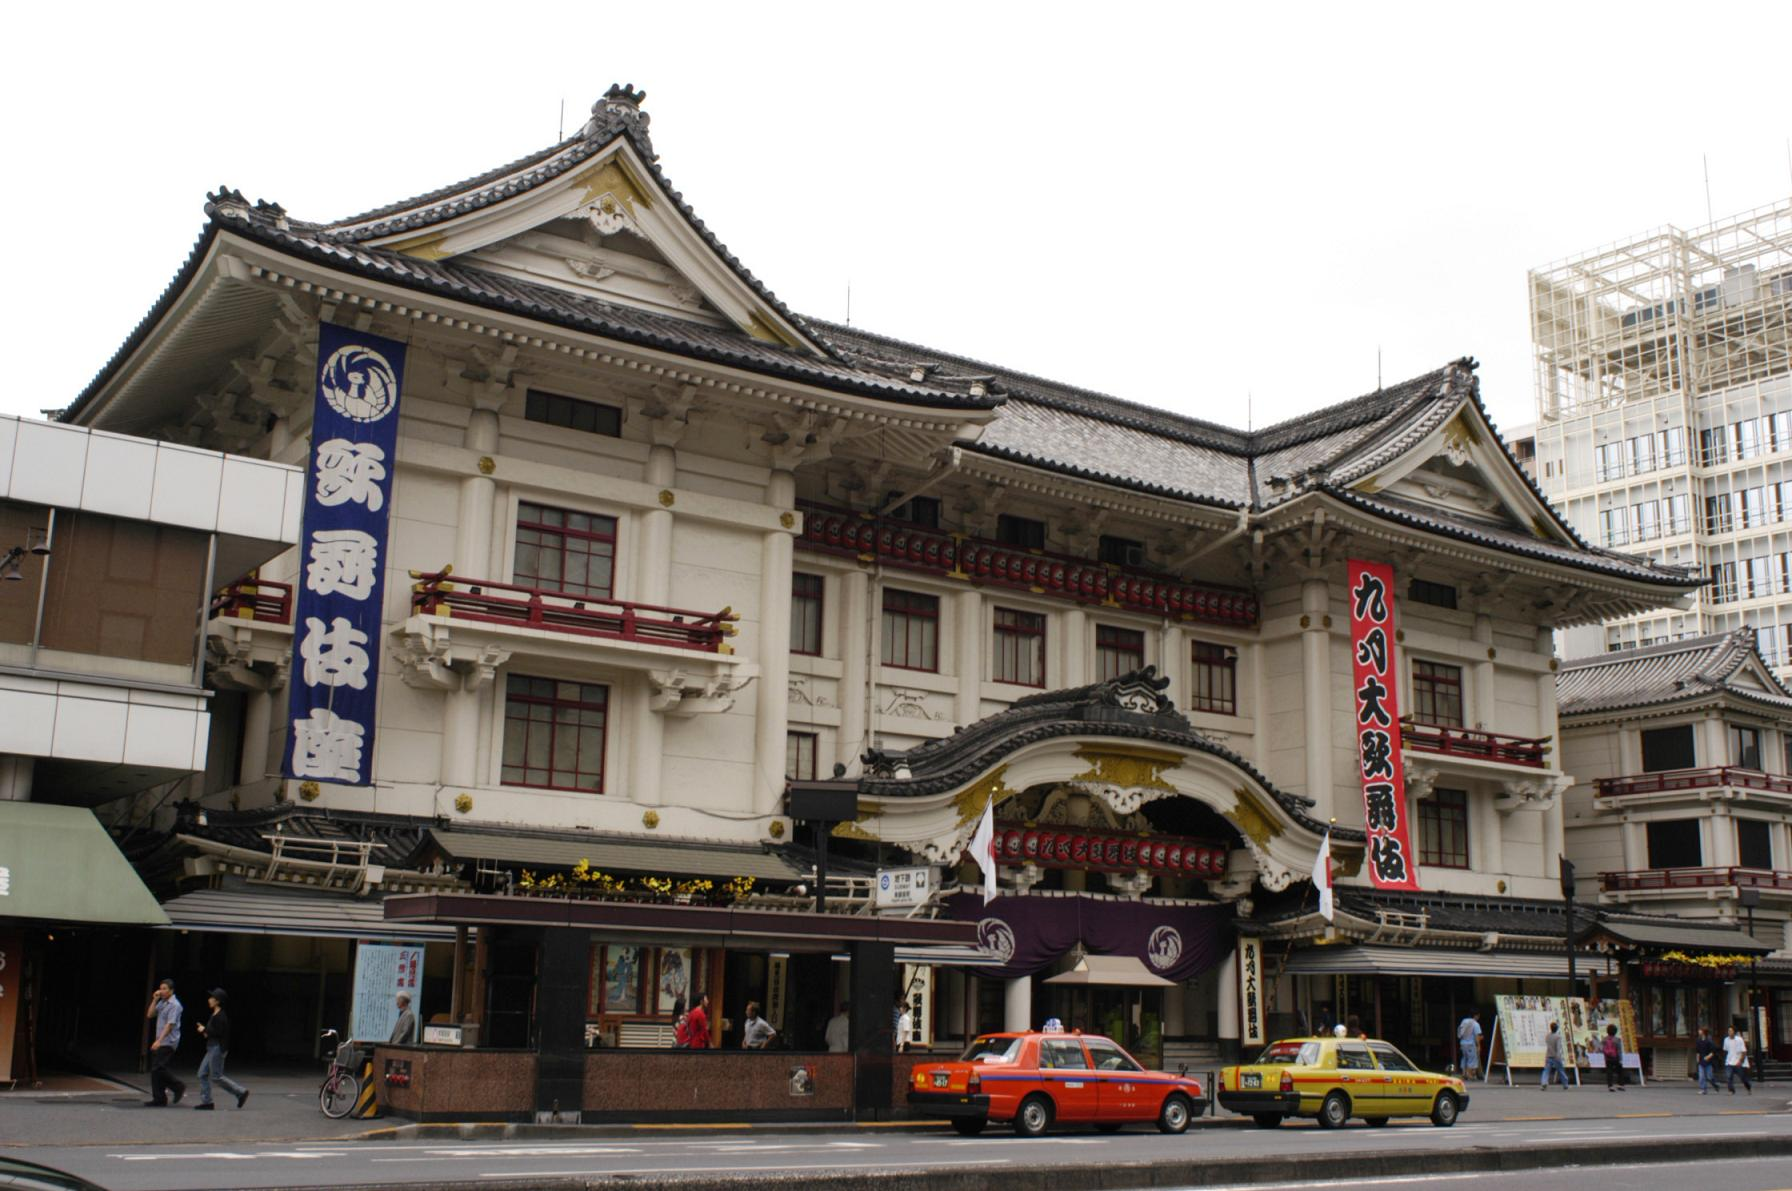 Circuito JAPÃO BANZAI (Hiroshima y Nikko)